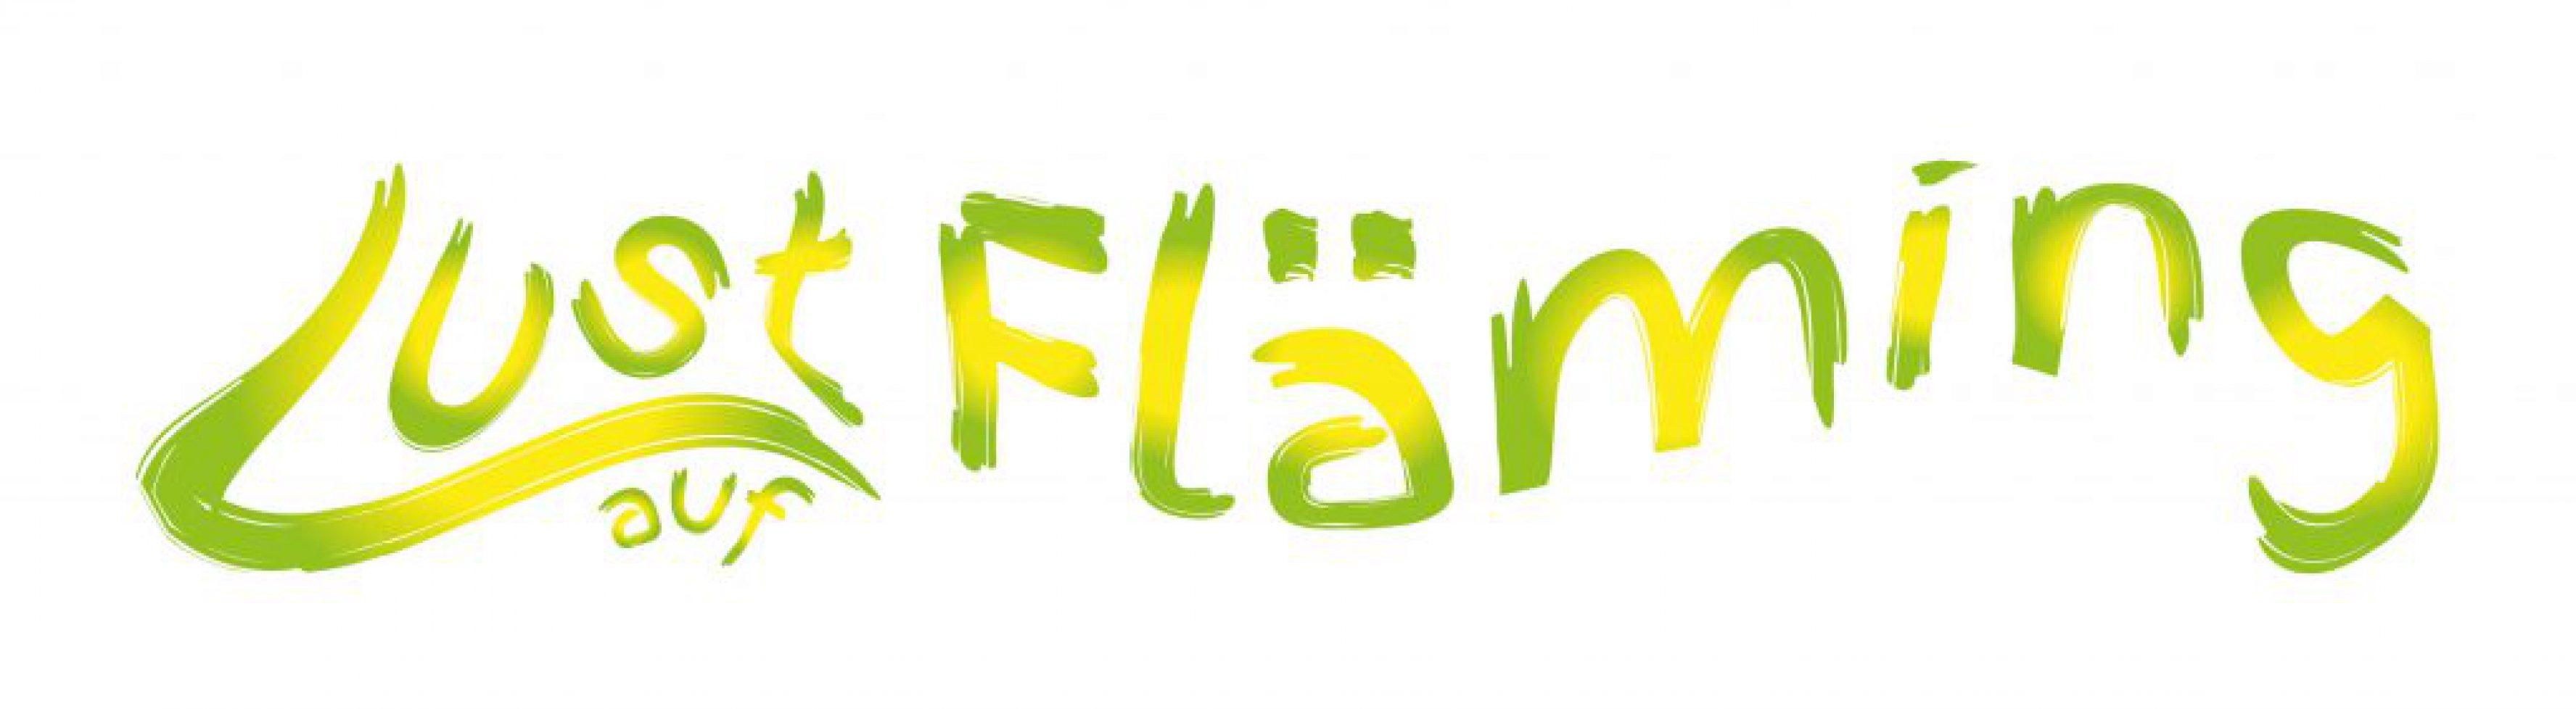 FlaemingMagazin-r